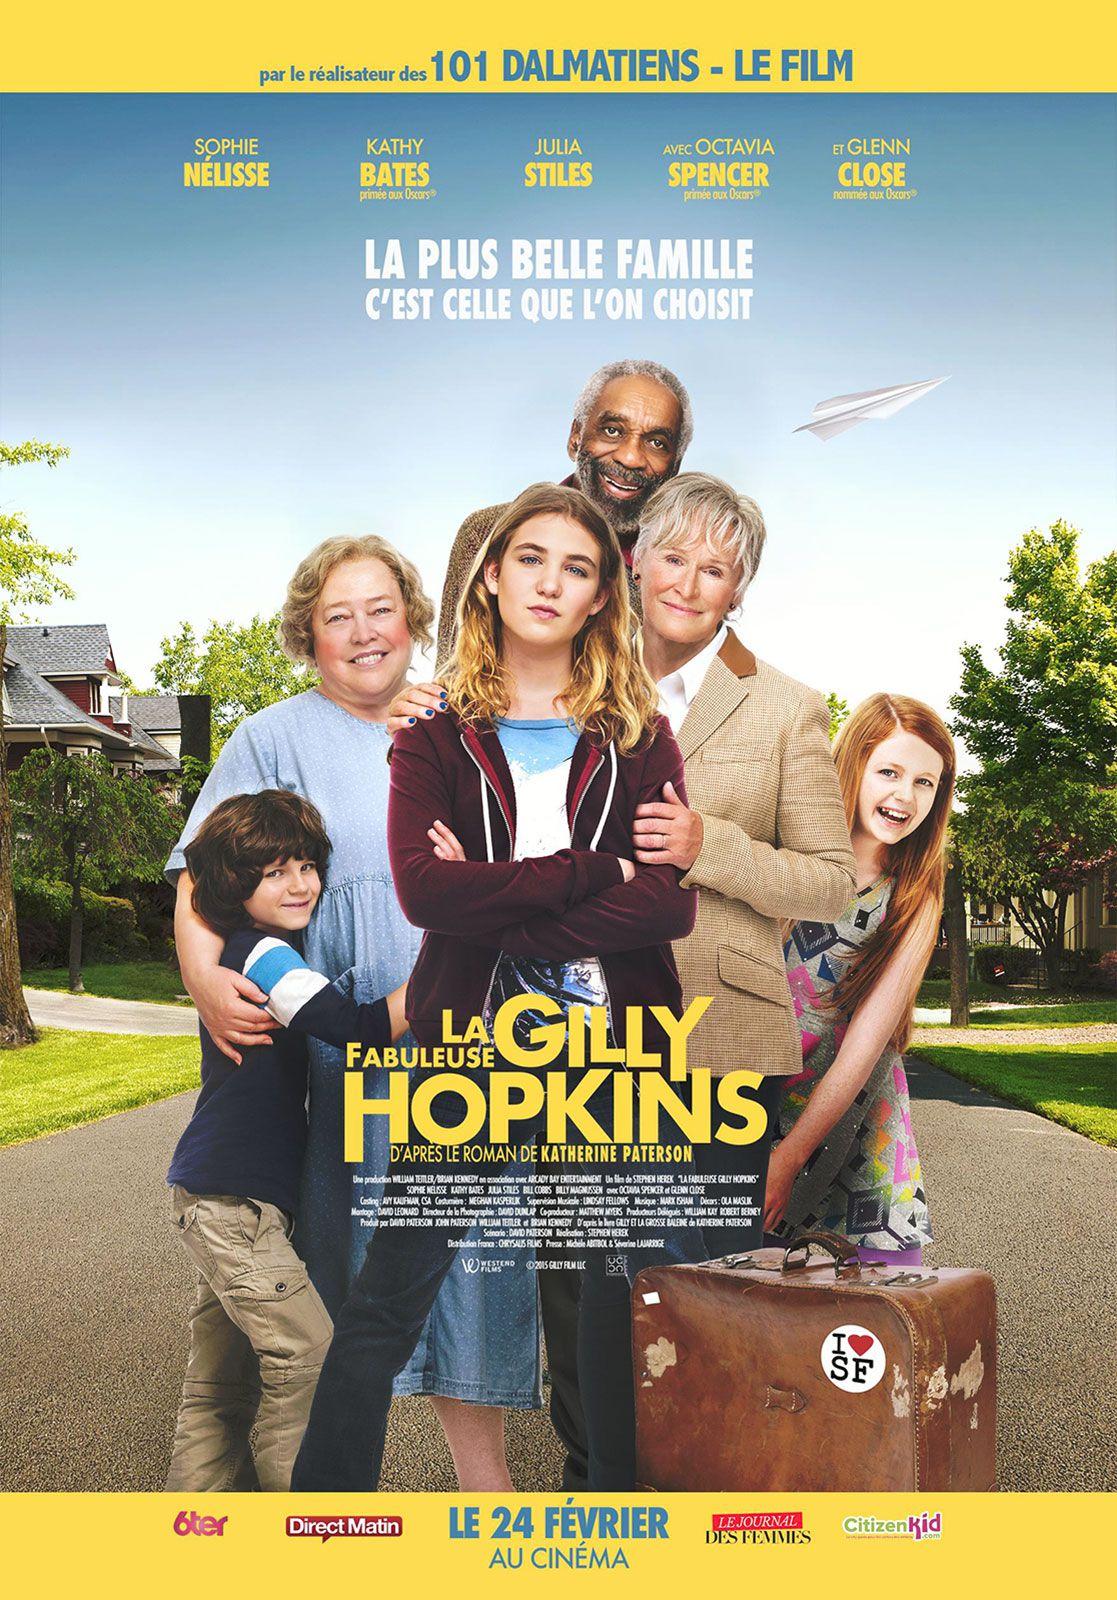 La Fabuleuse Gilly Hopkins - Film (2016)